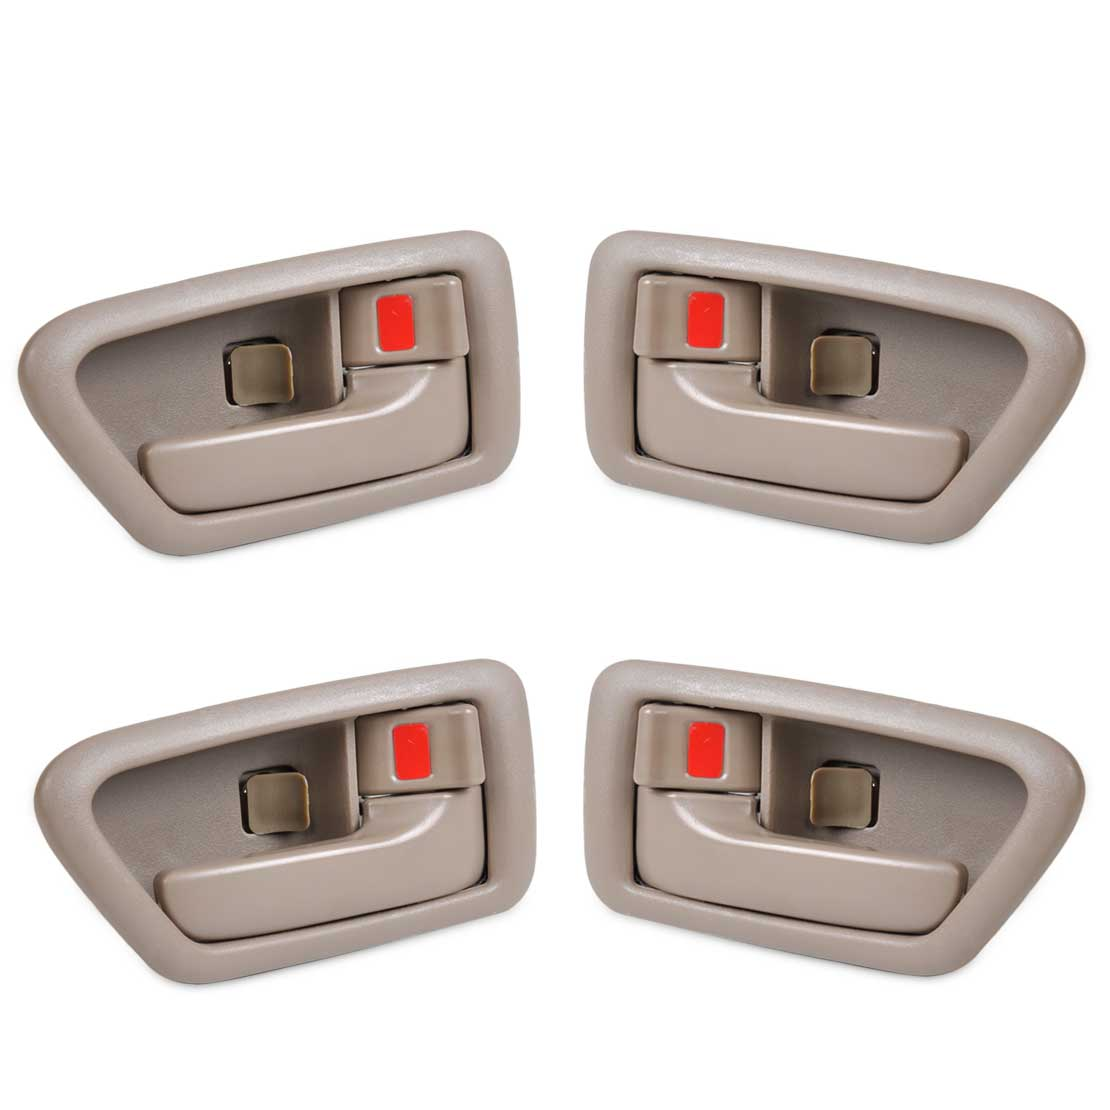 Beler 4 шт. правой и левой внутри дверь ободок ручки для Toyota Camry 1997 1998 1999 2000 2001 69205AA010E0 69206AA010E0